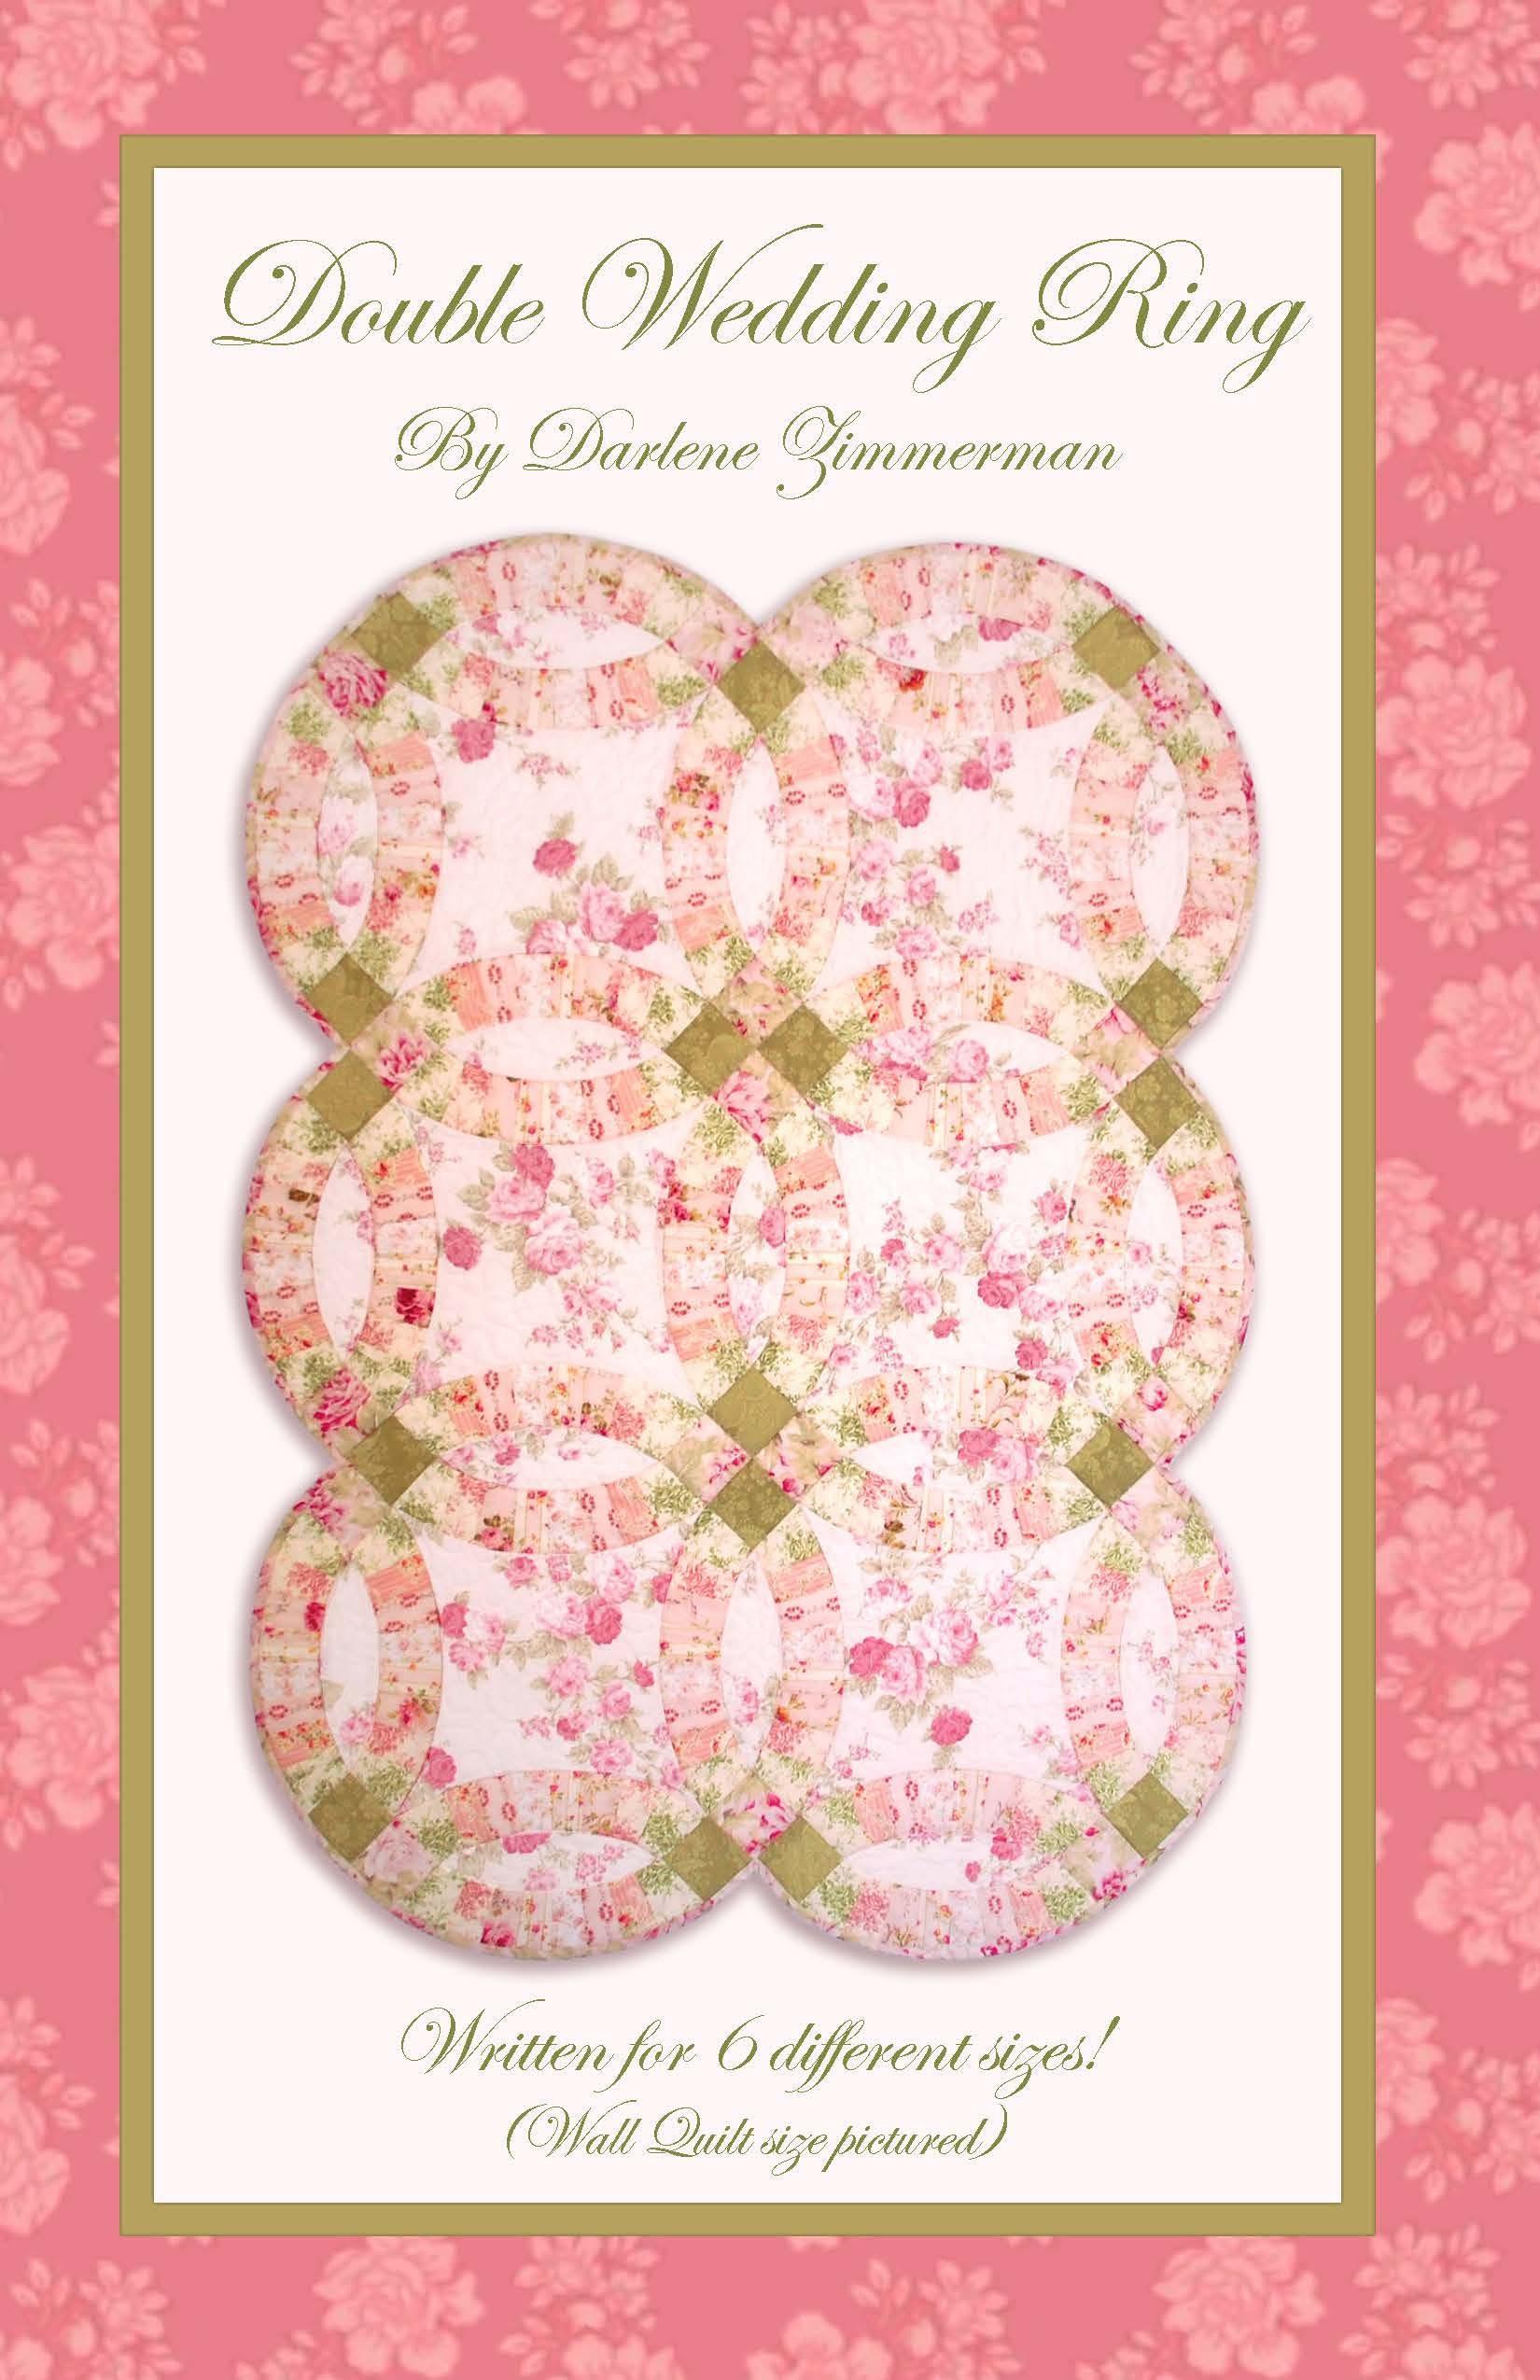 Double Wedding Ring quilt patttern by Darlene Zimmerman 6